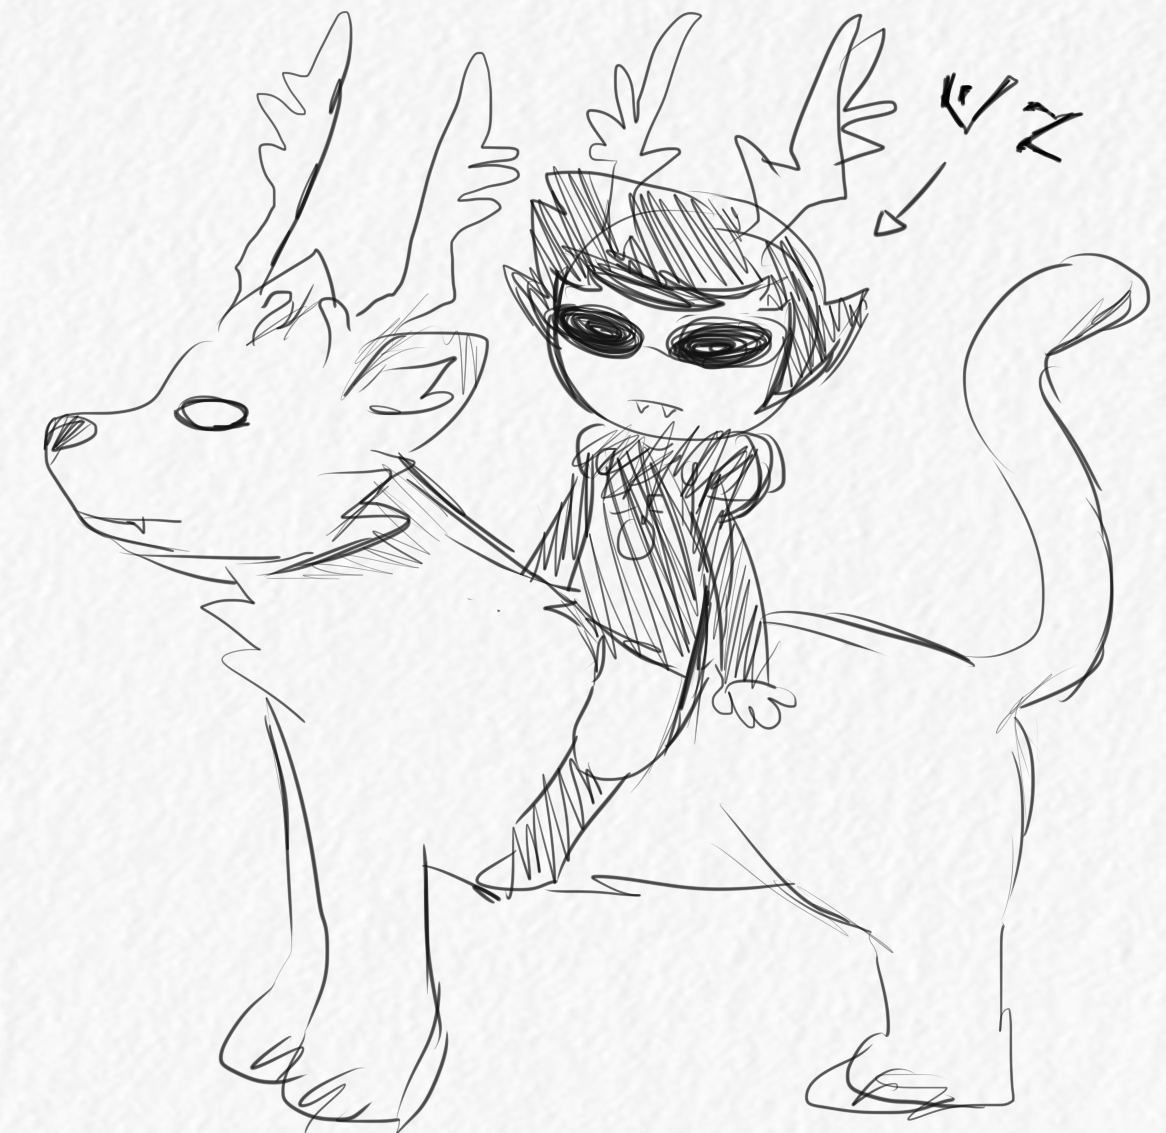 Dammek's drawing